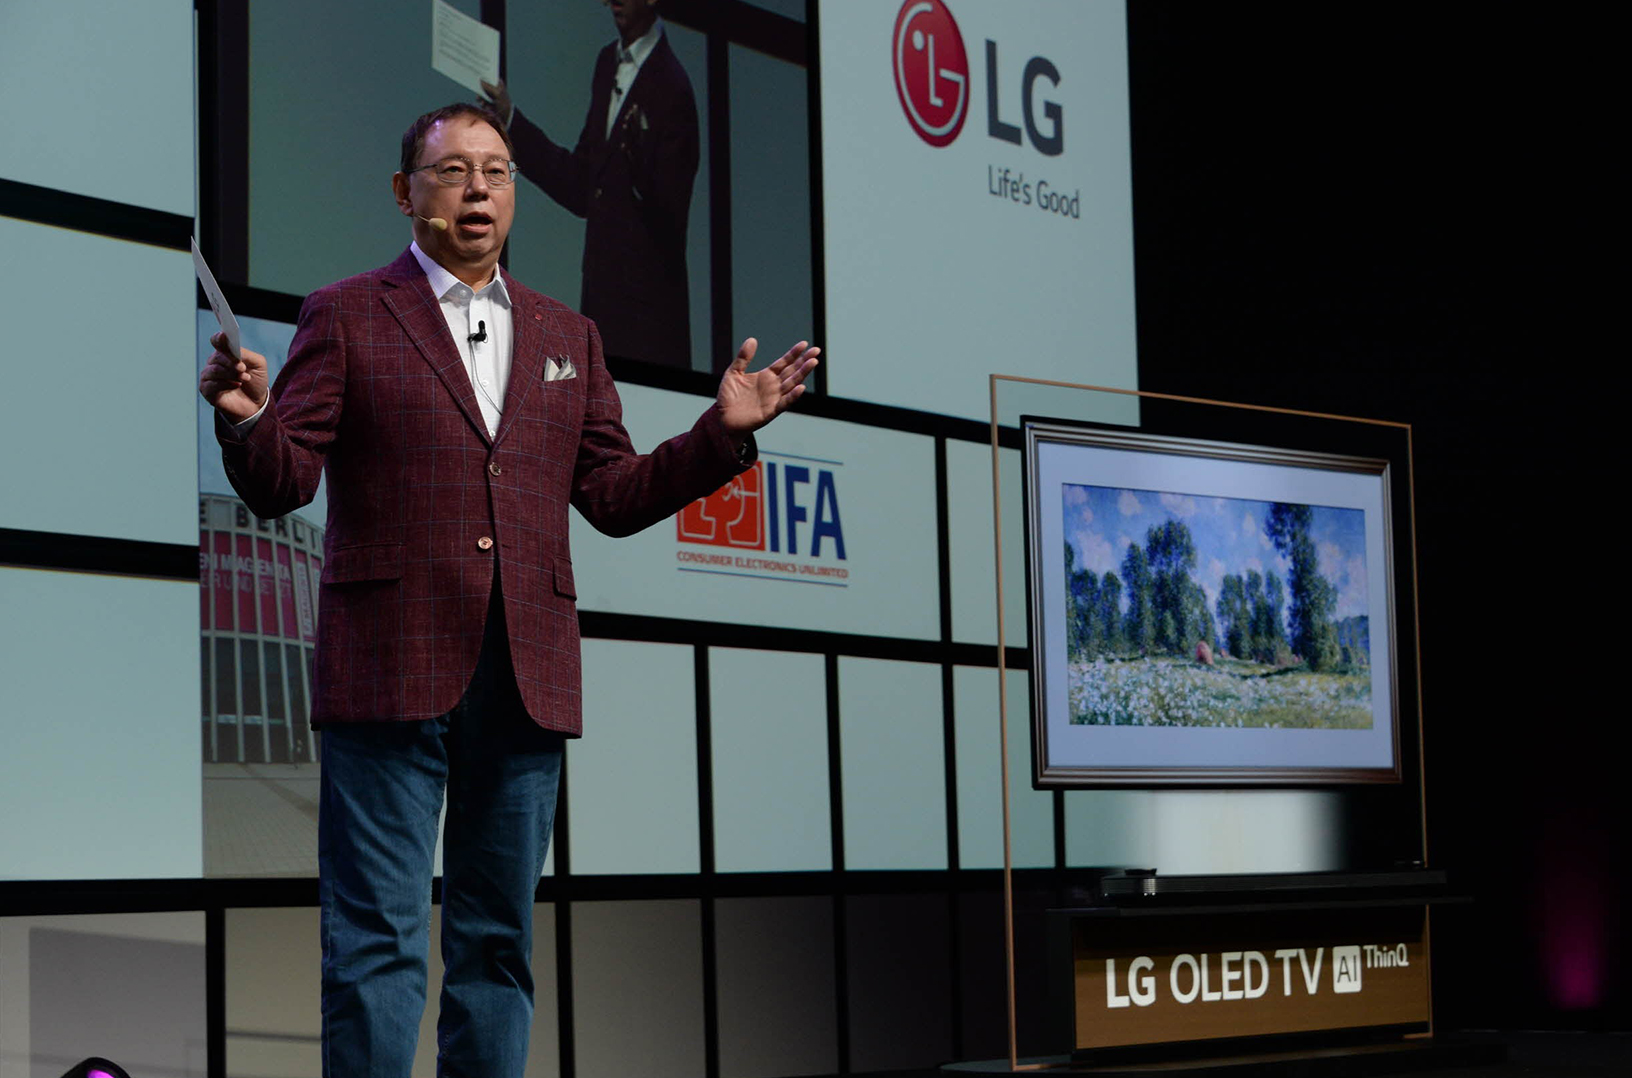 lg ifa 2018 portada